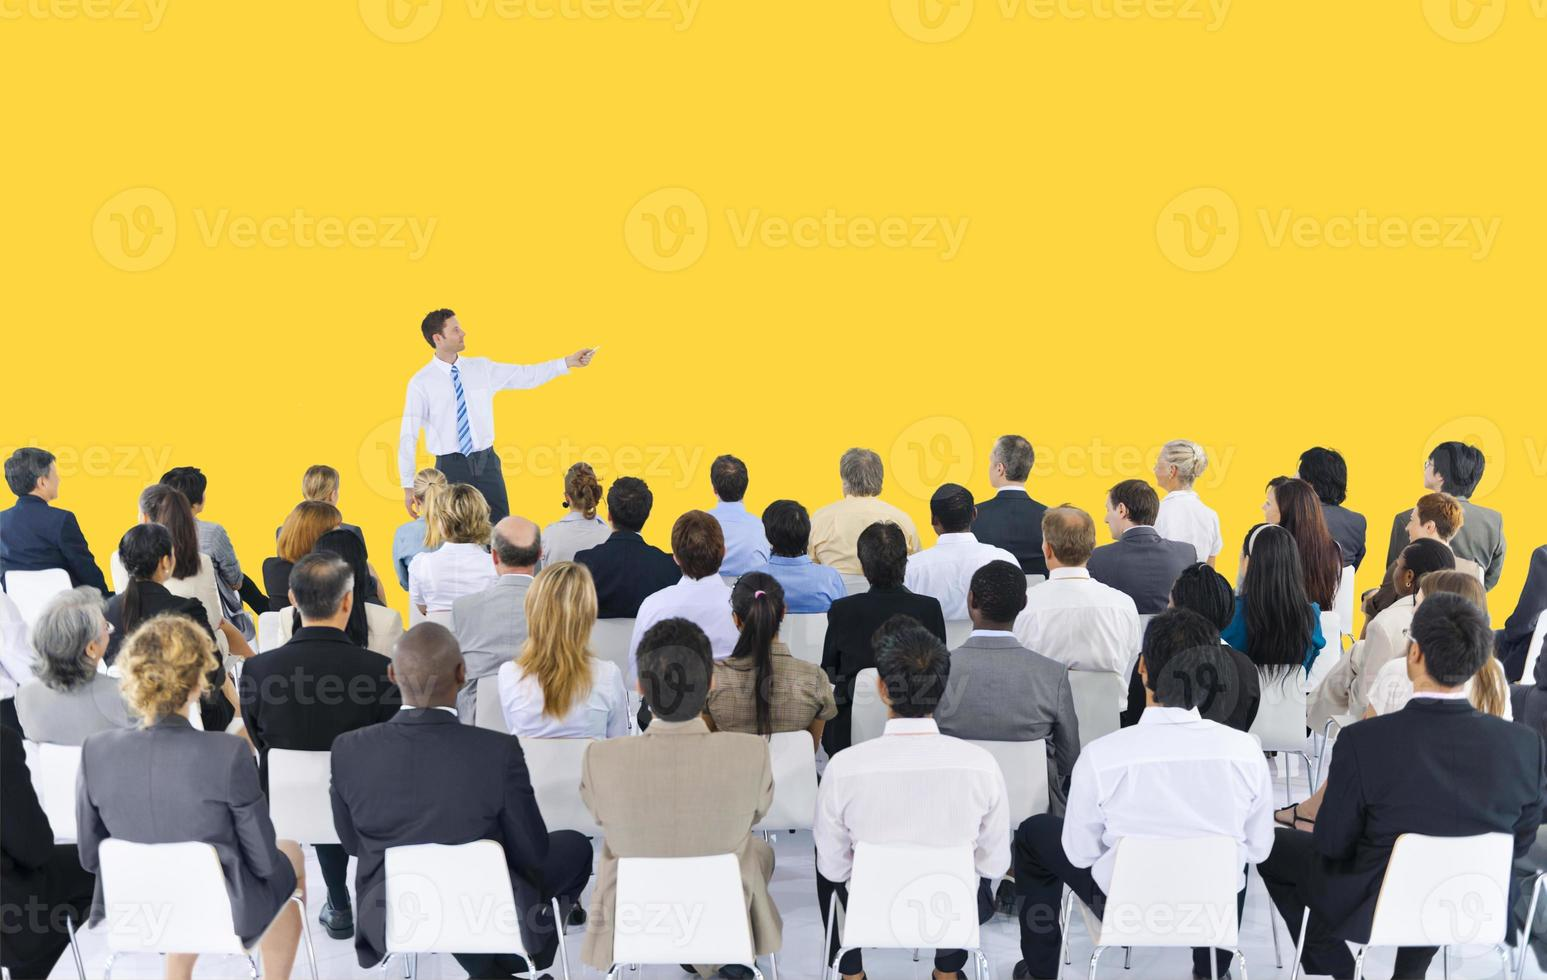 affärsfolk seminarium konferensmöte presentation koncept foto